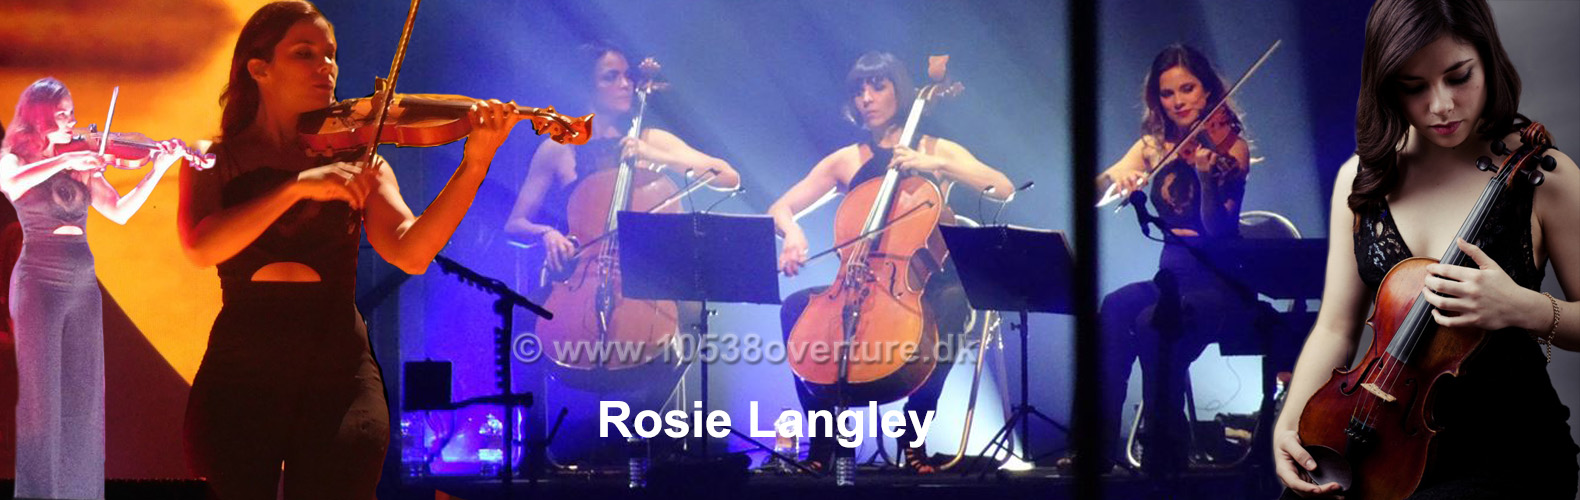 Rosie Langley